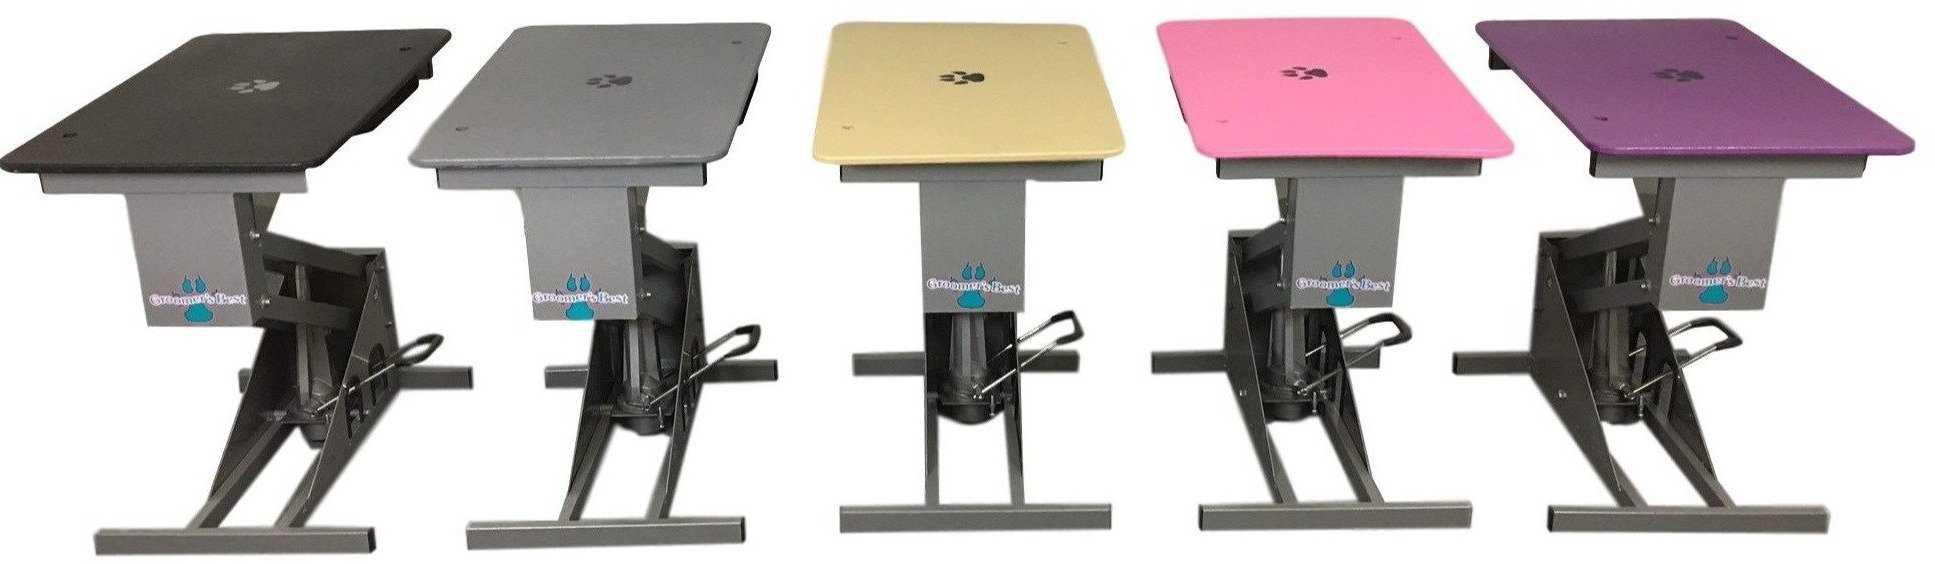 GROOMER'S BEST ELECTRIC GROOMING TABLE